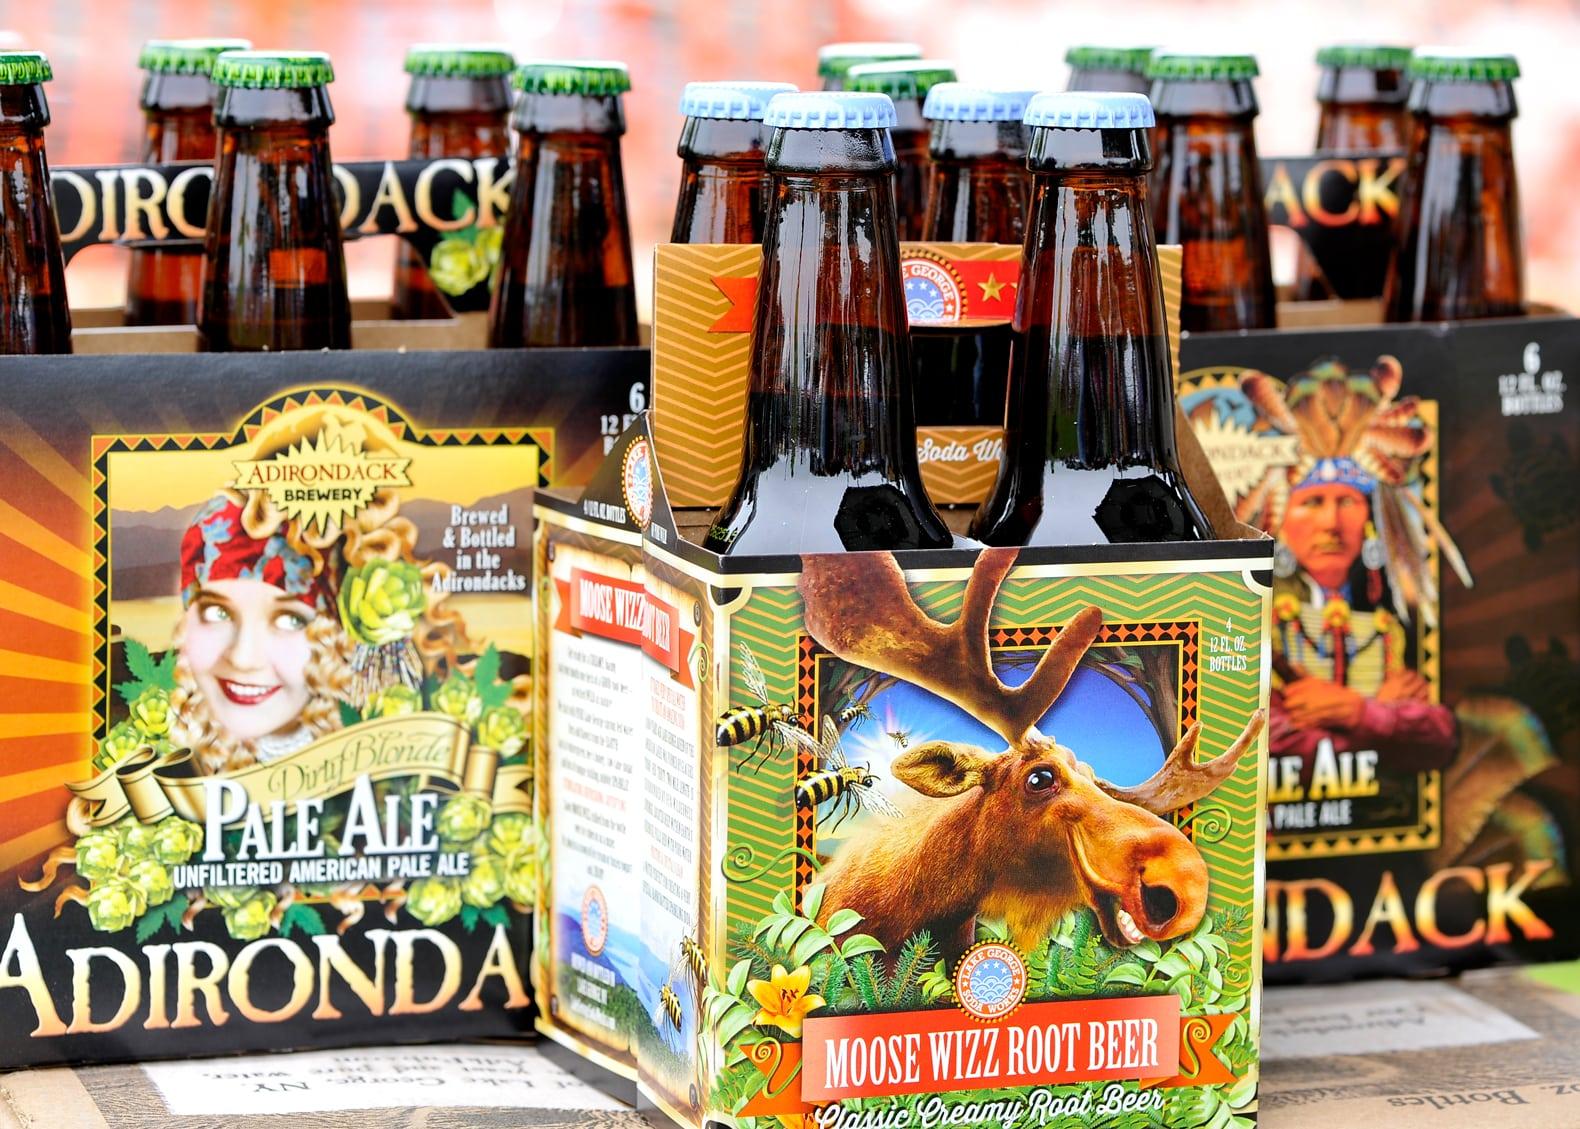 adk-brewery-6-packs-close